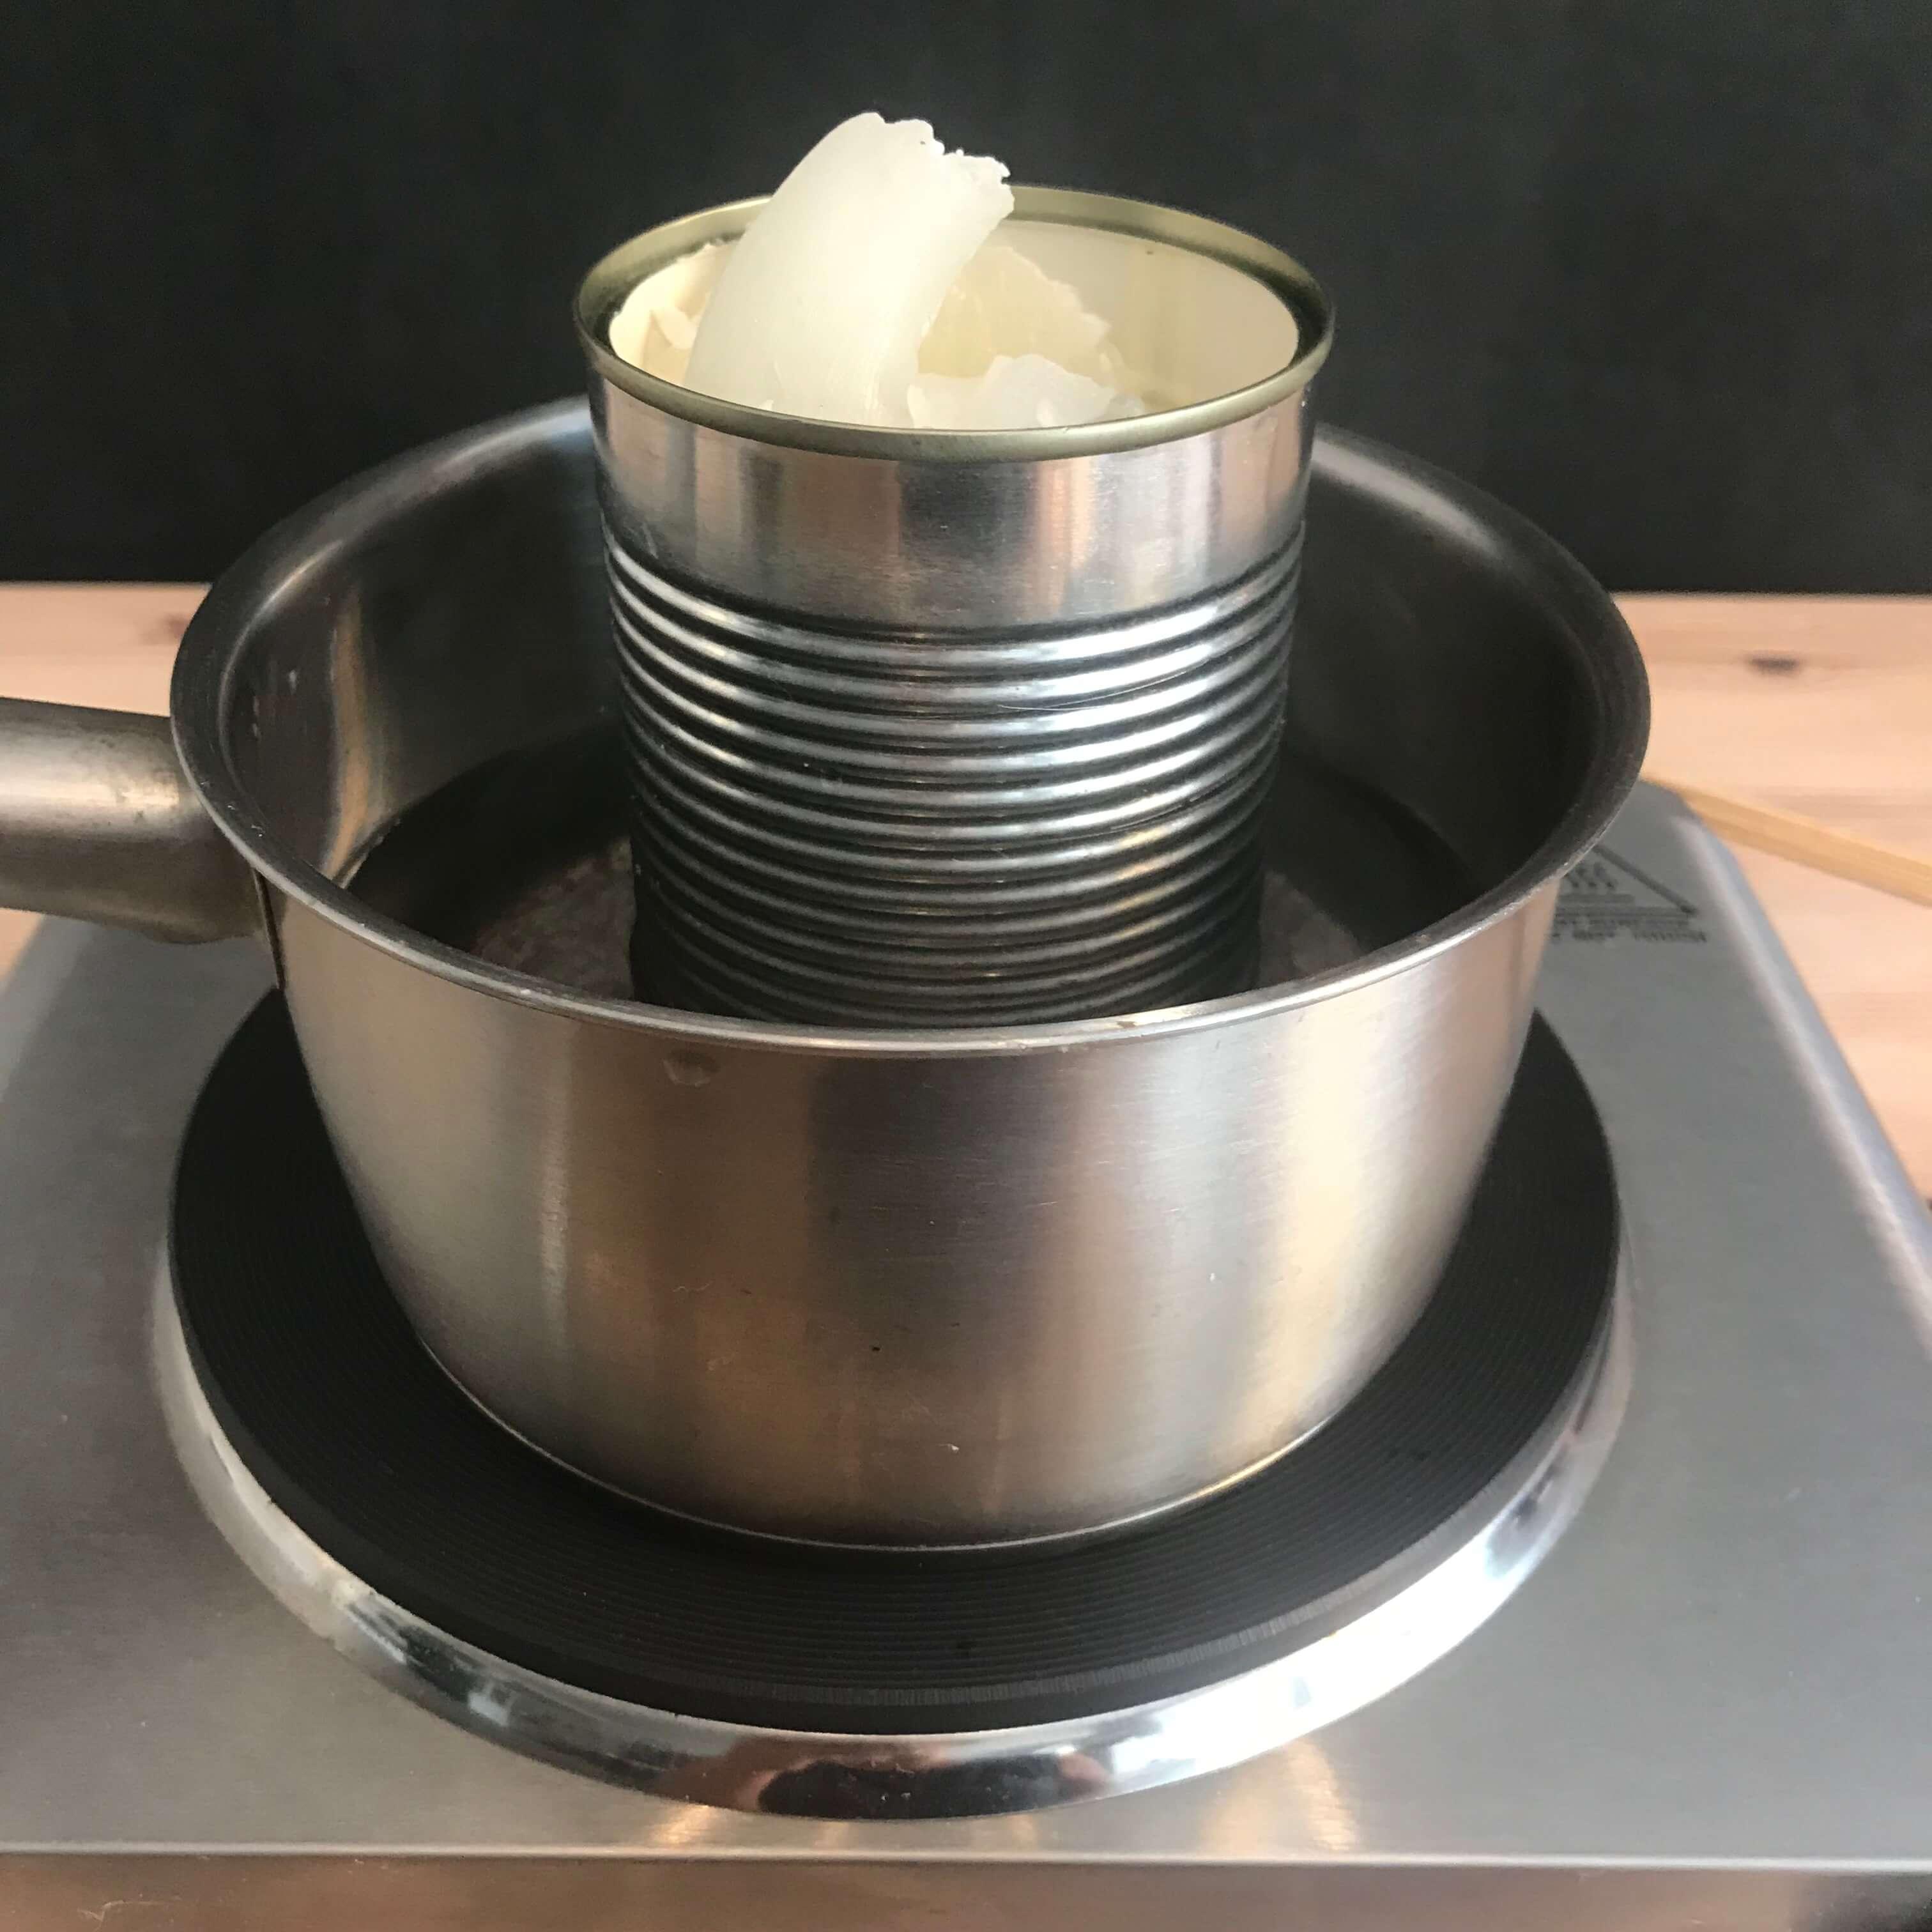 Citronella Kerzen selbermachen Wachs schmelzen